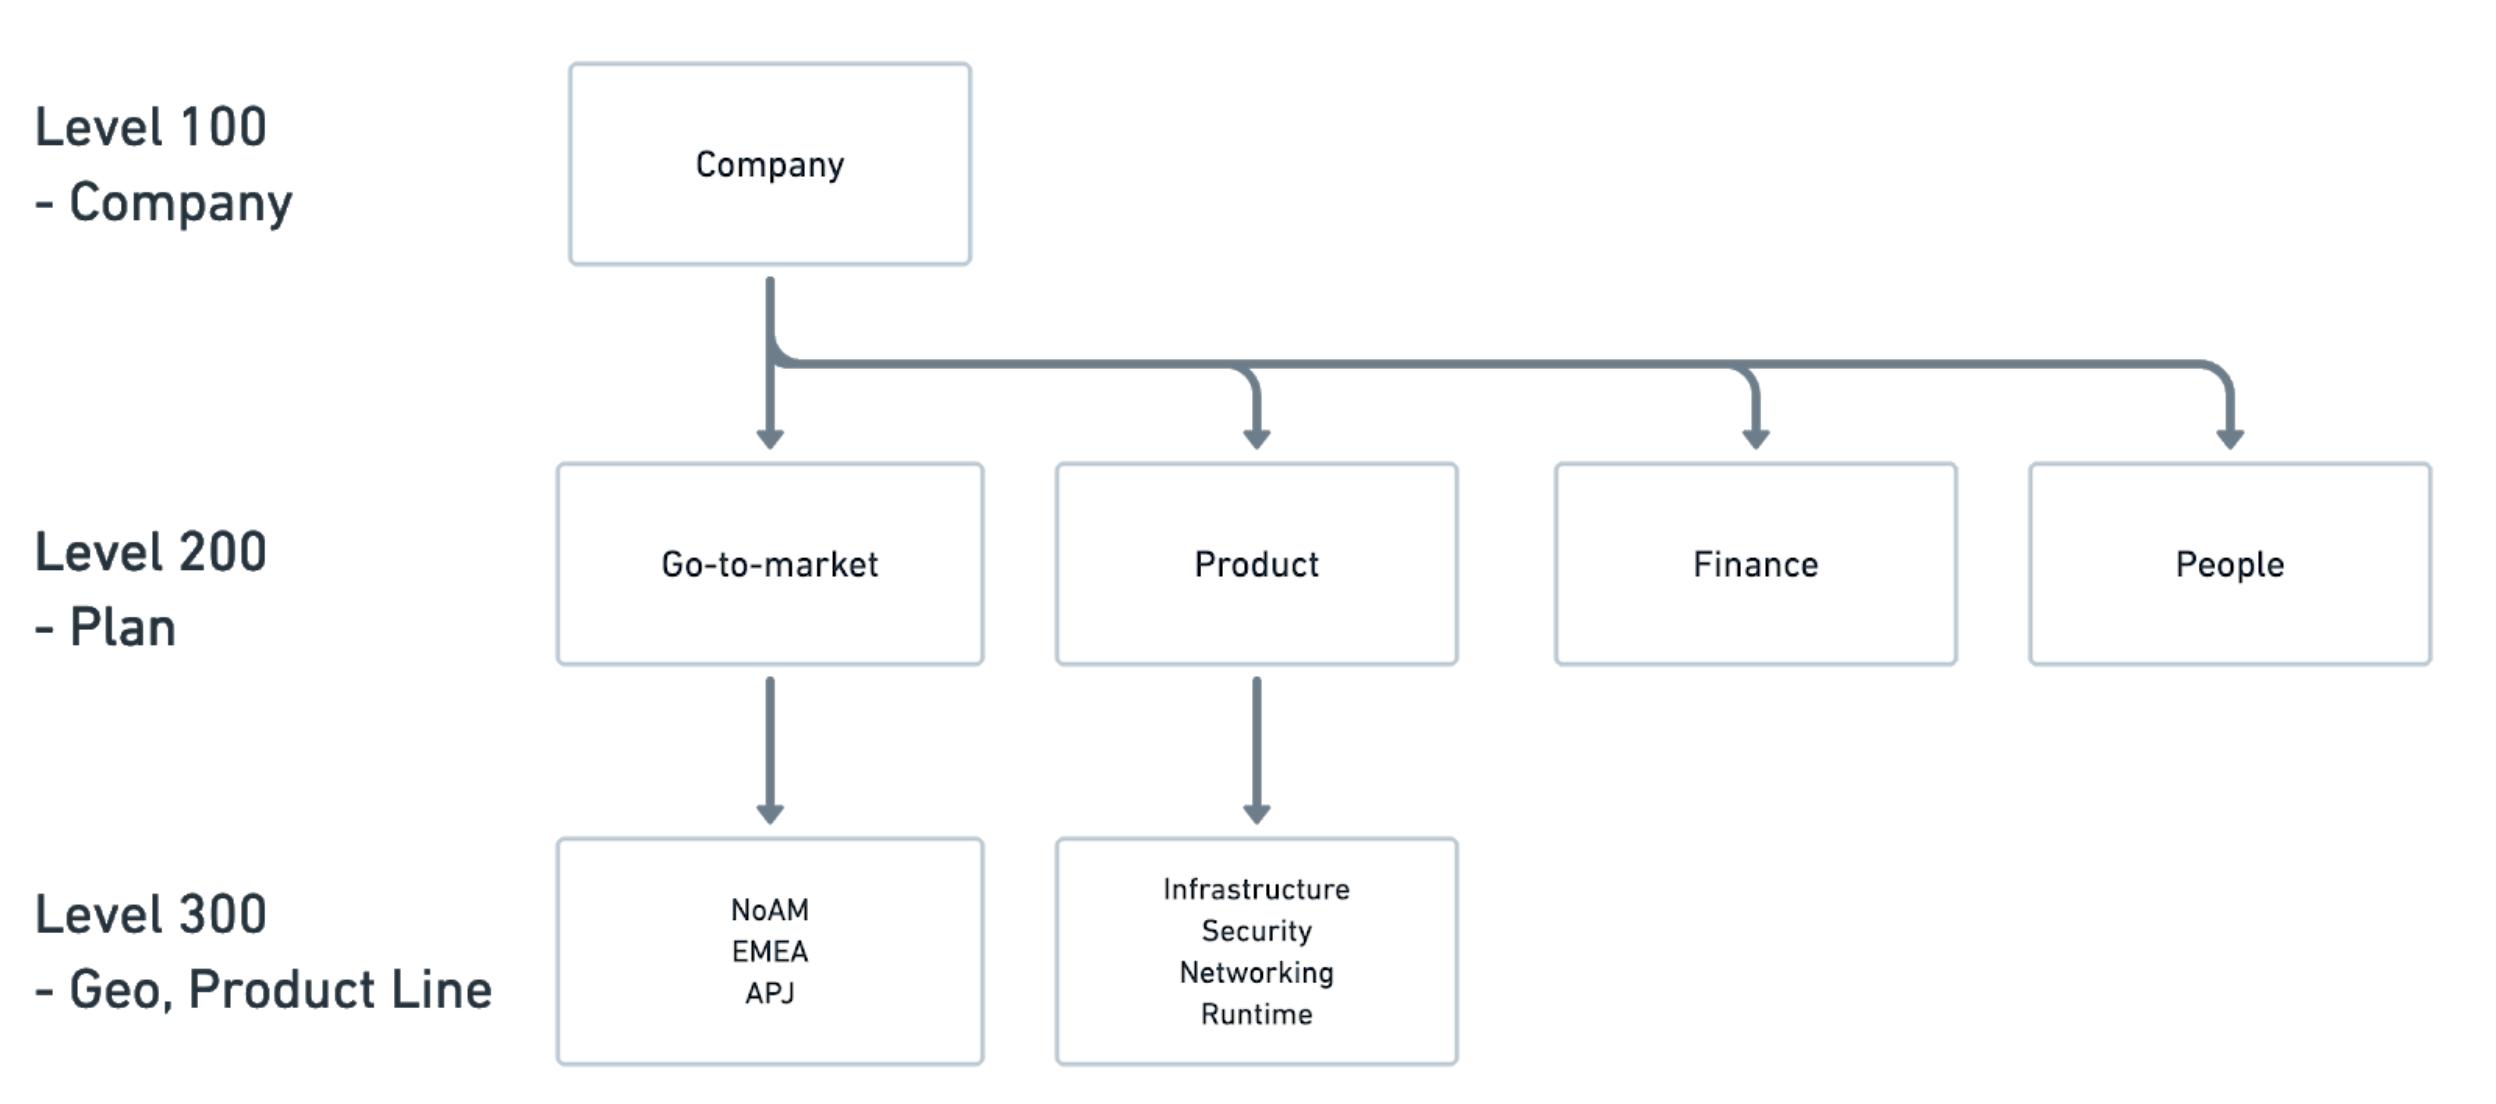 Company score card chart breakdown.  Level 100 (Company), Level 200 (Plan), Level 300 (Geo, Product Line)